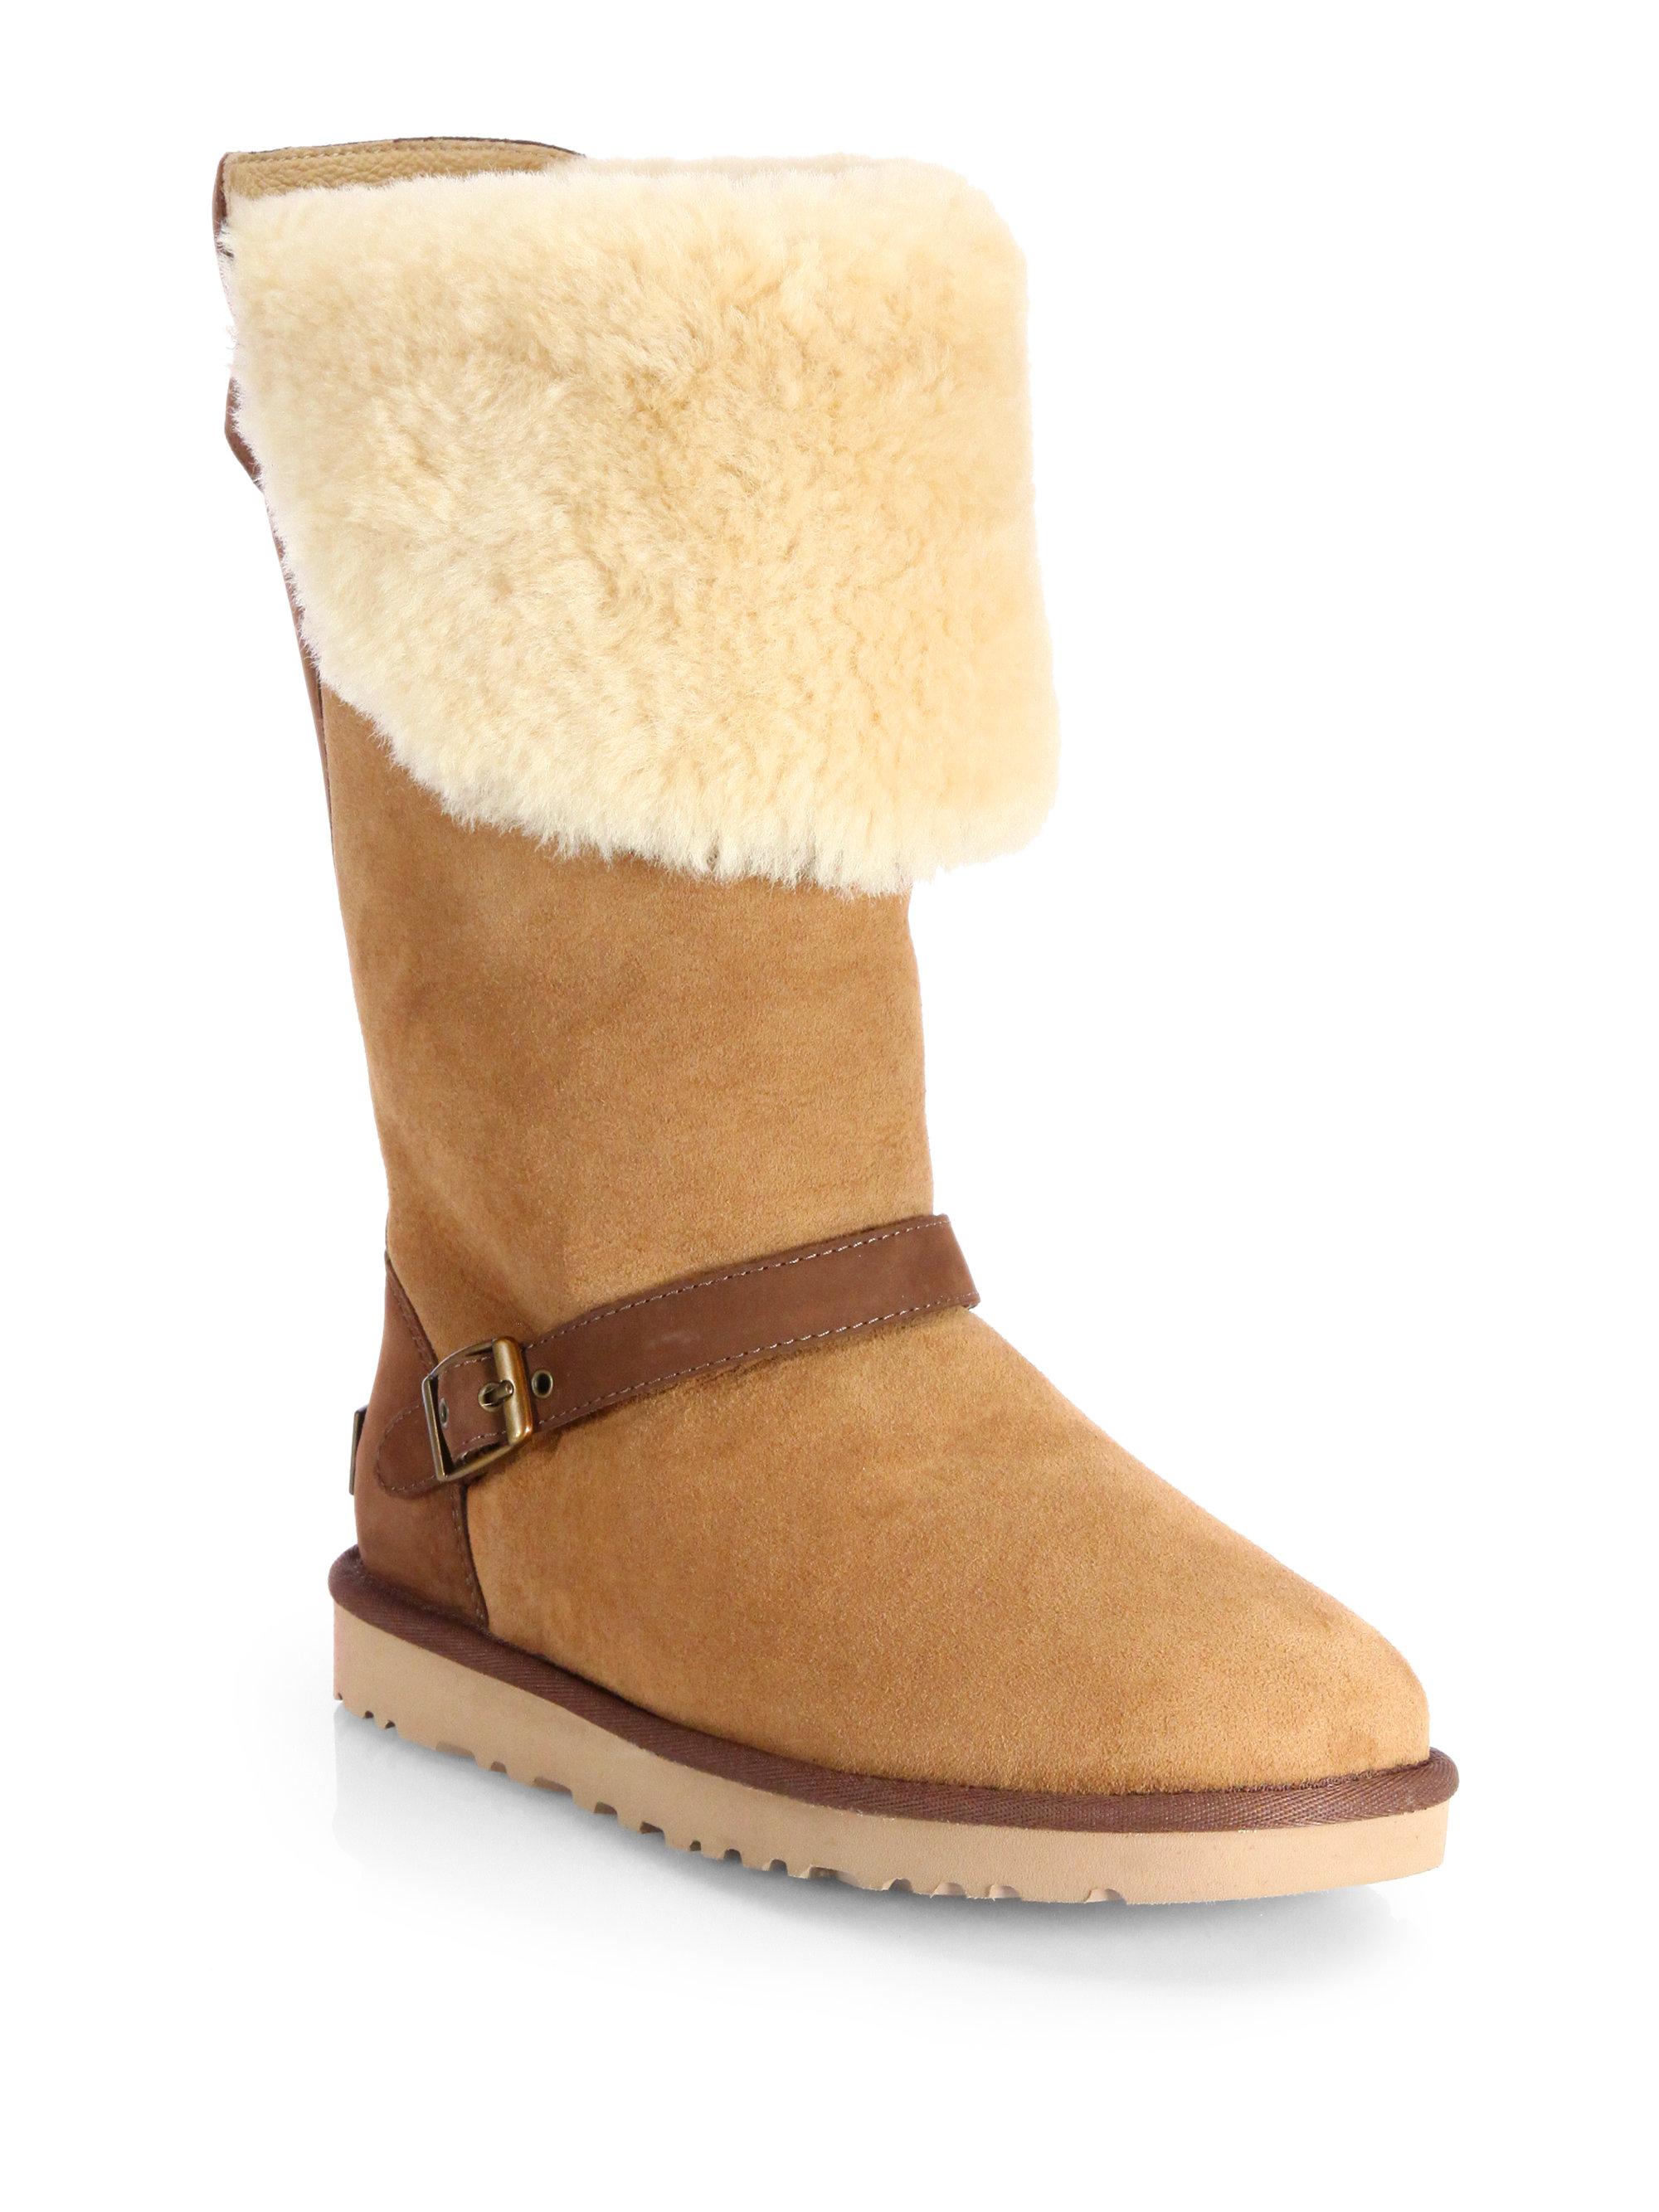 d5344d93bcf UGG Brown Ciera Shearlingtrimmed Suede Boots